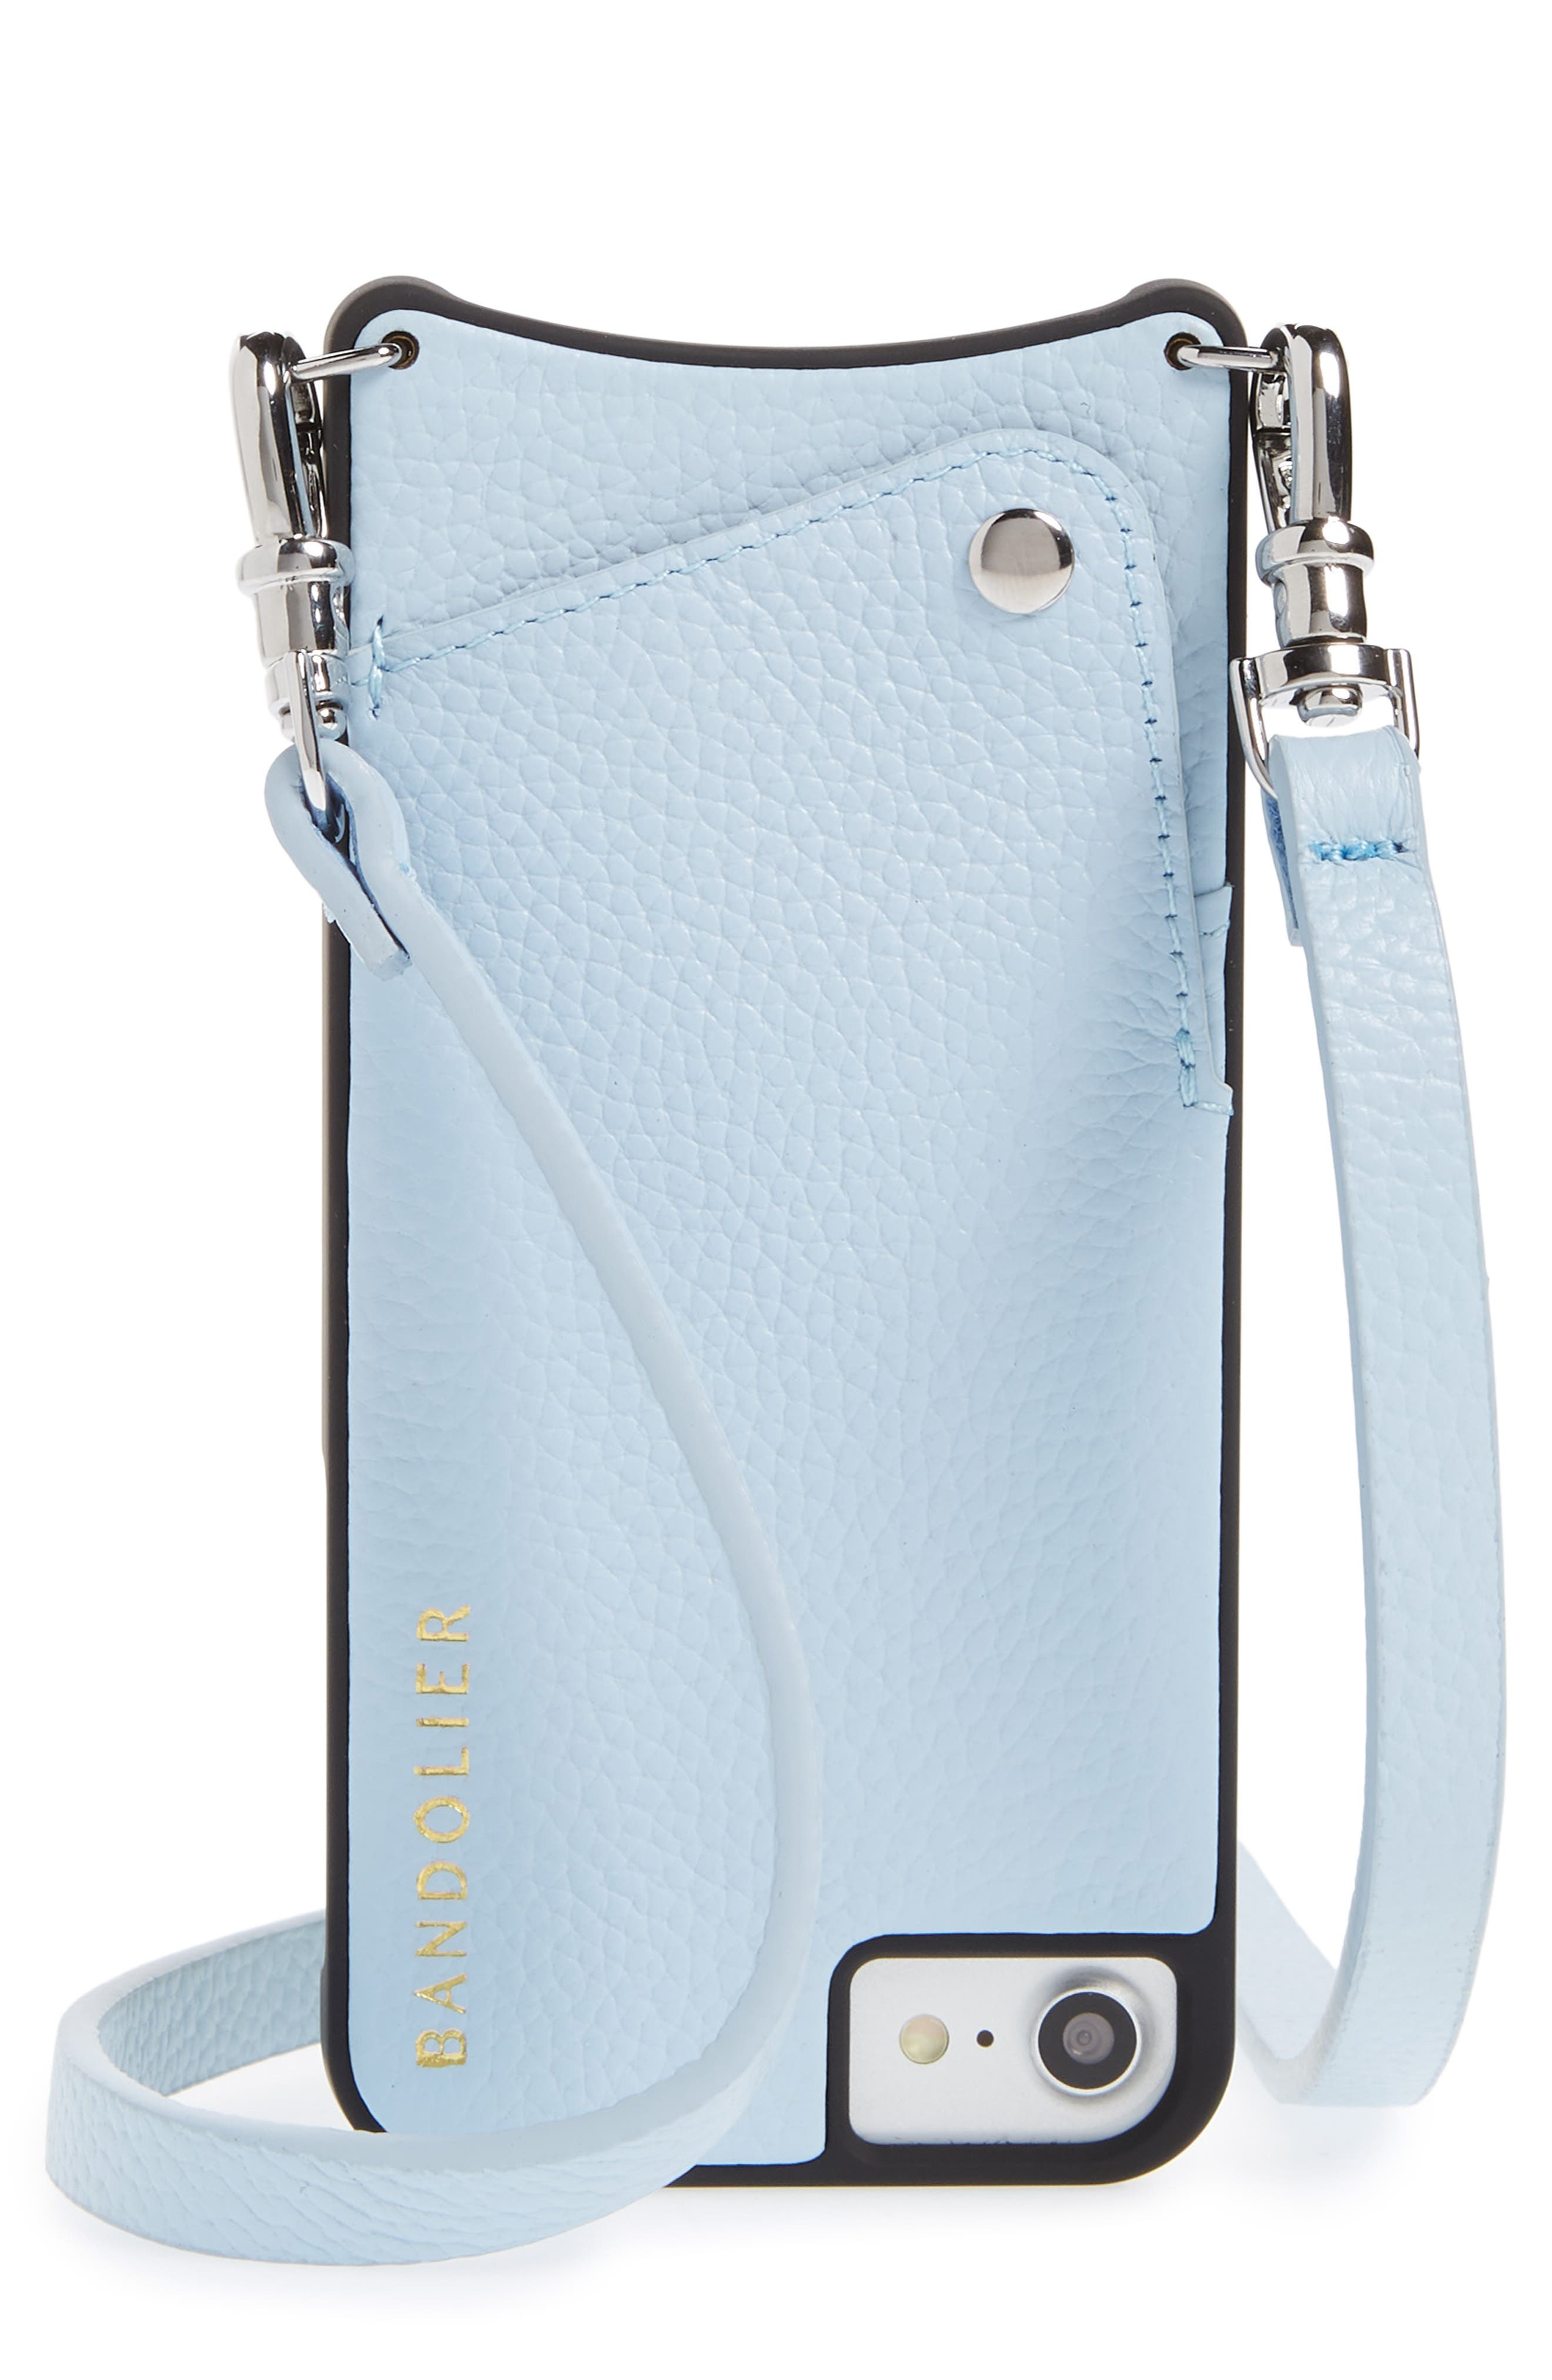 Emma Leather iPhone 6/7/8 & 6/7/8 Plus Crossbody Case,                             Main thumbnail 1, color,                             Light Blue/ Silver